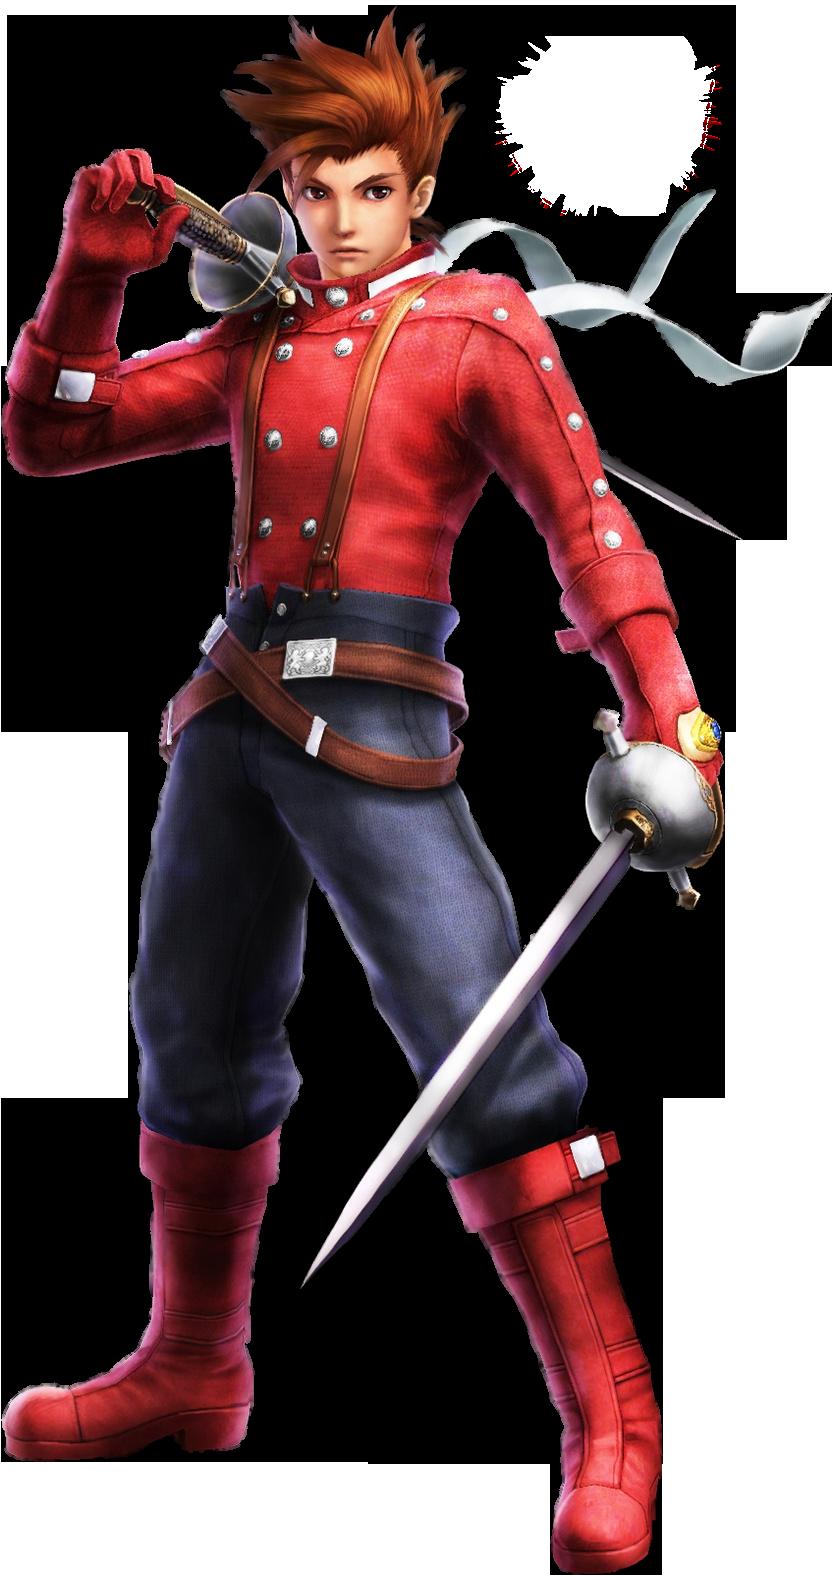 Super Smash Bros. 6/Lloyd Irving